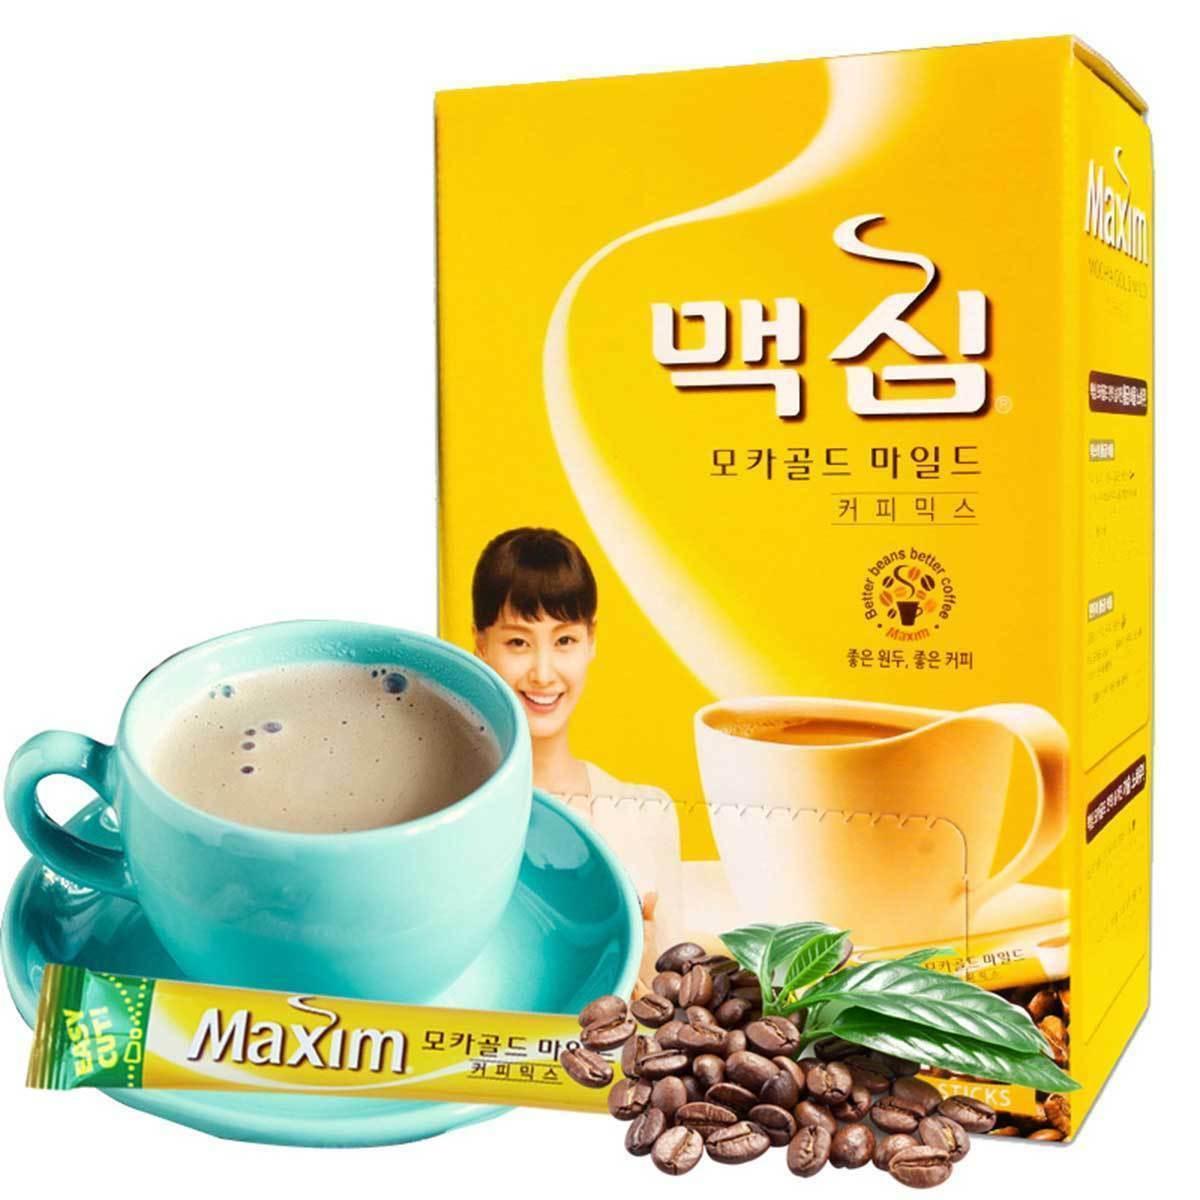 Home & Garden New Mocha Gold Light Coffee Mix 50 Sticks Instant Coffee Mix maxim